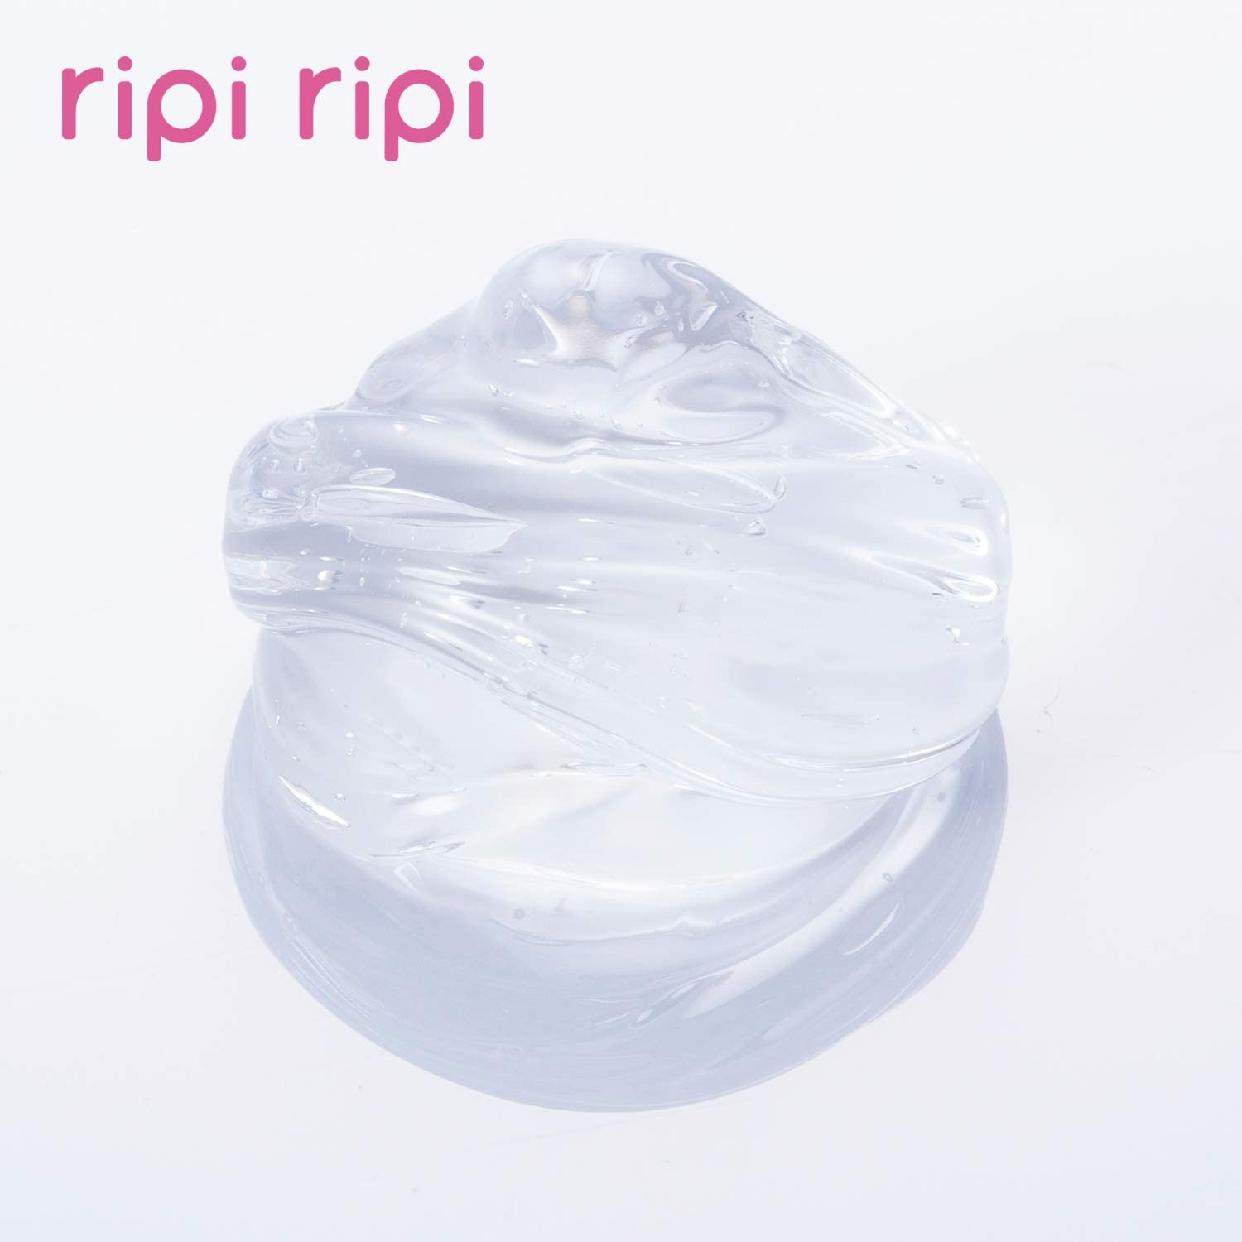 ripi ripi(リピリピ)ヘアグロスの商品画像3